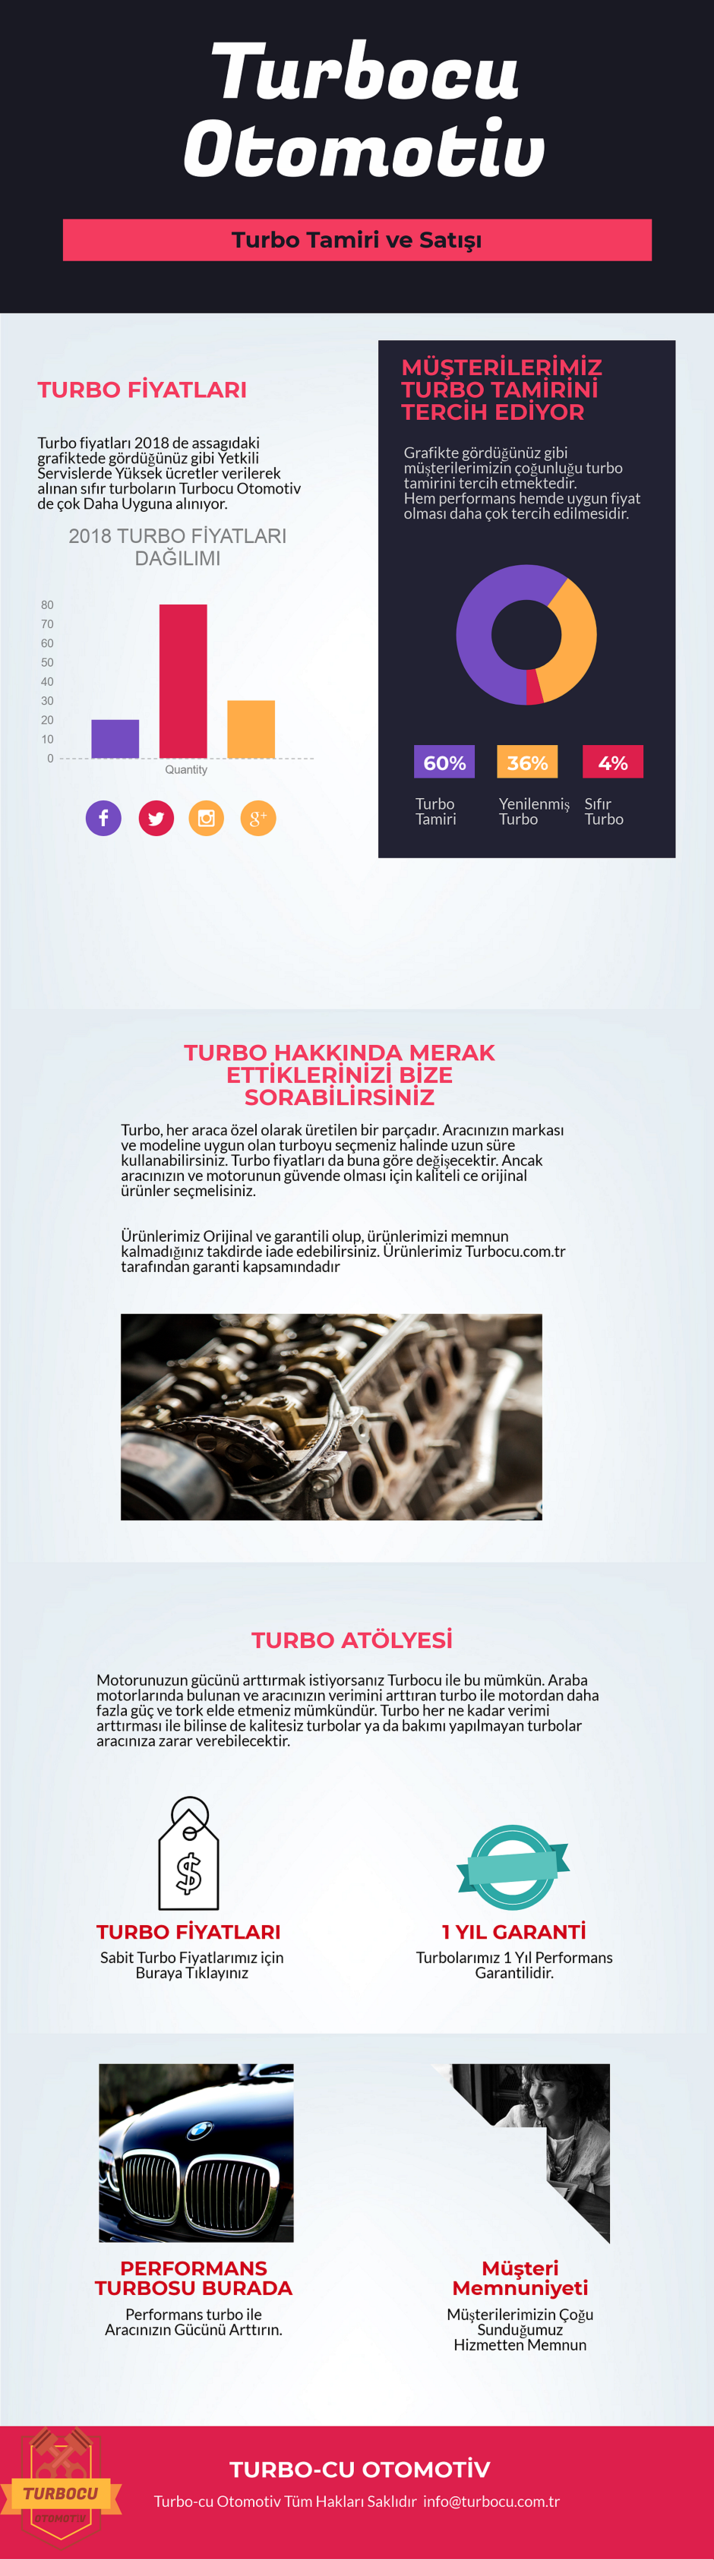 Turbocu Otomotiv